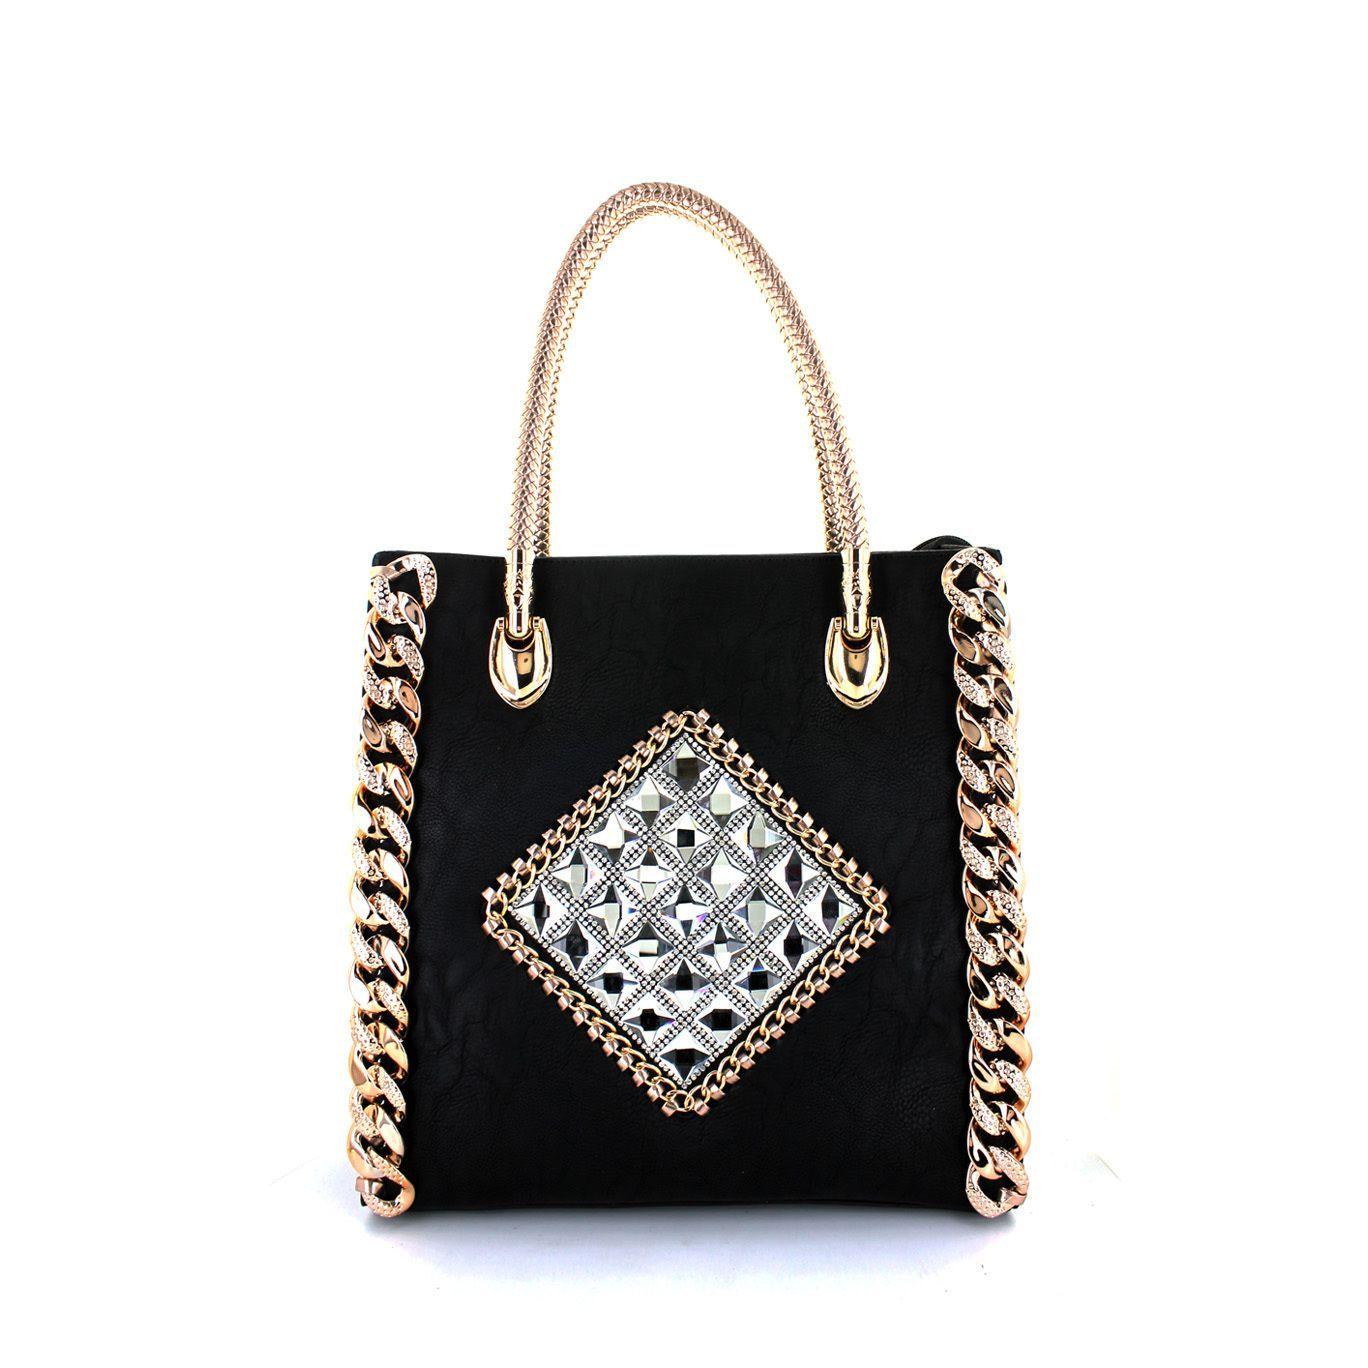 Lany 'Shine Bright' Fashion Tote Bag, Women's